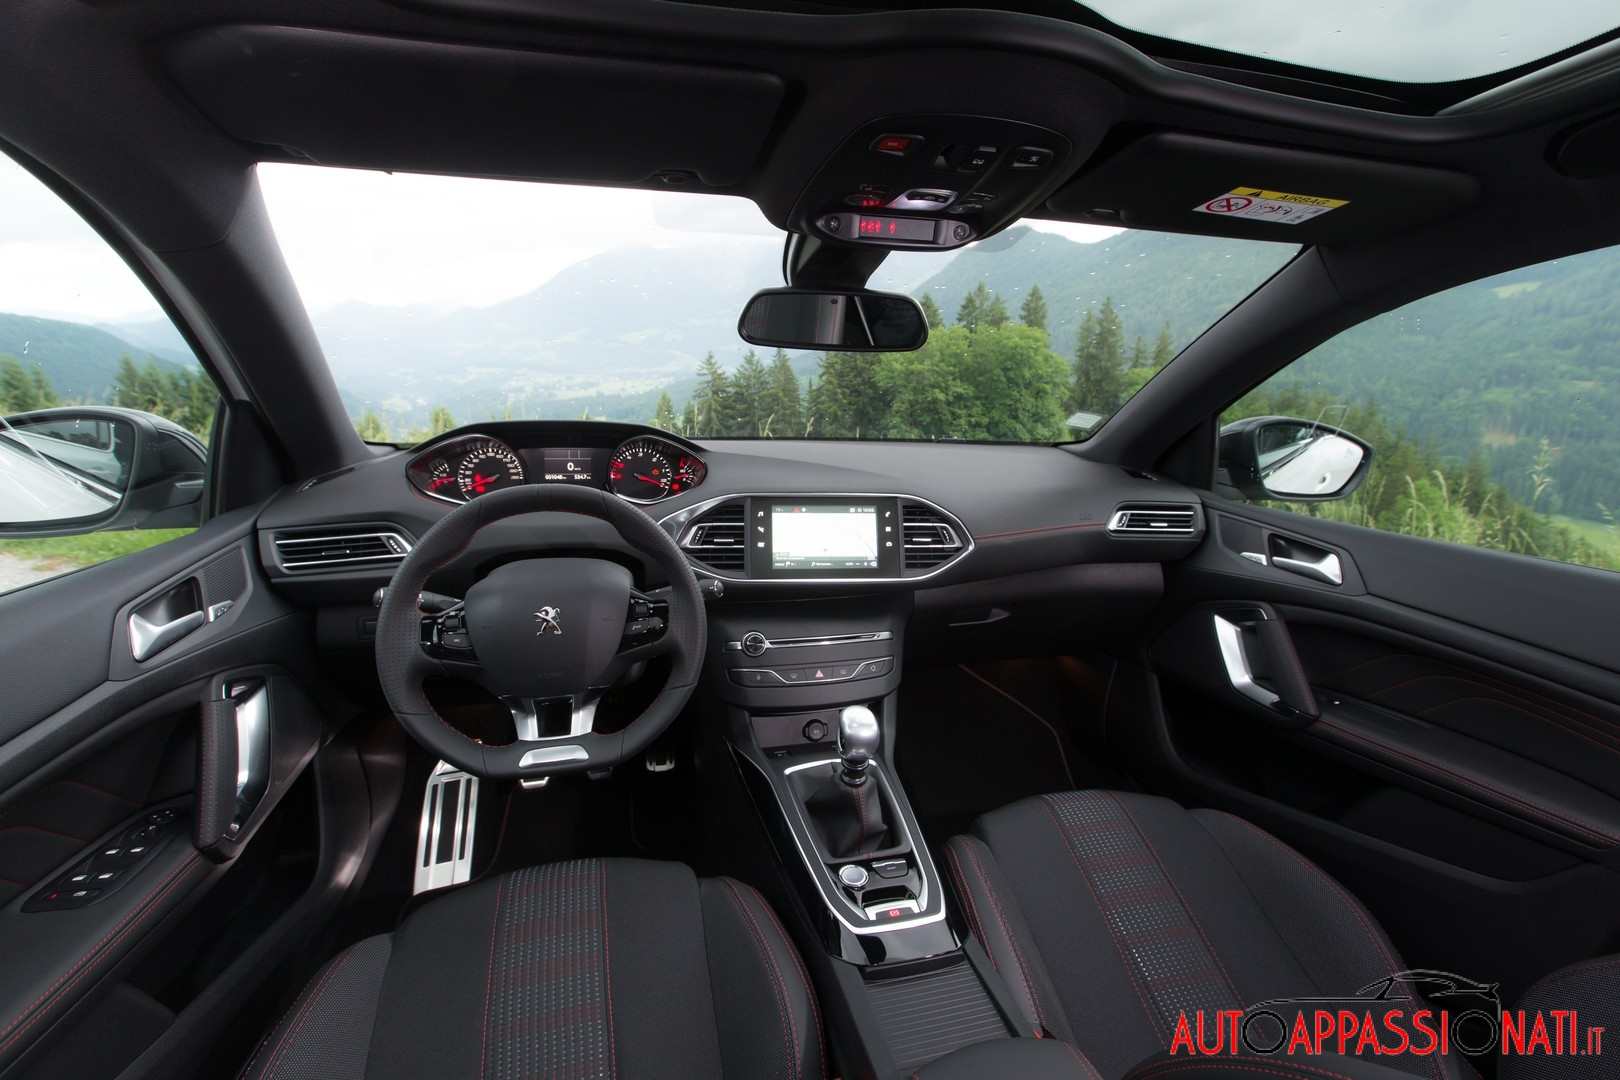 Peugeot 308 2017 interni